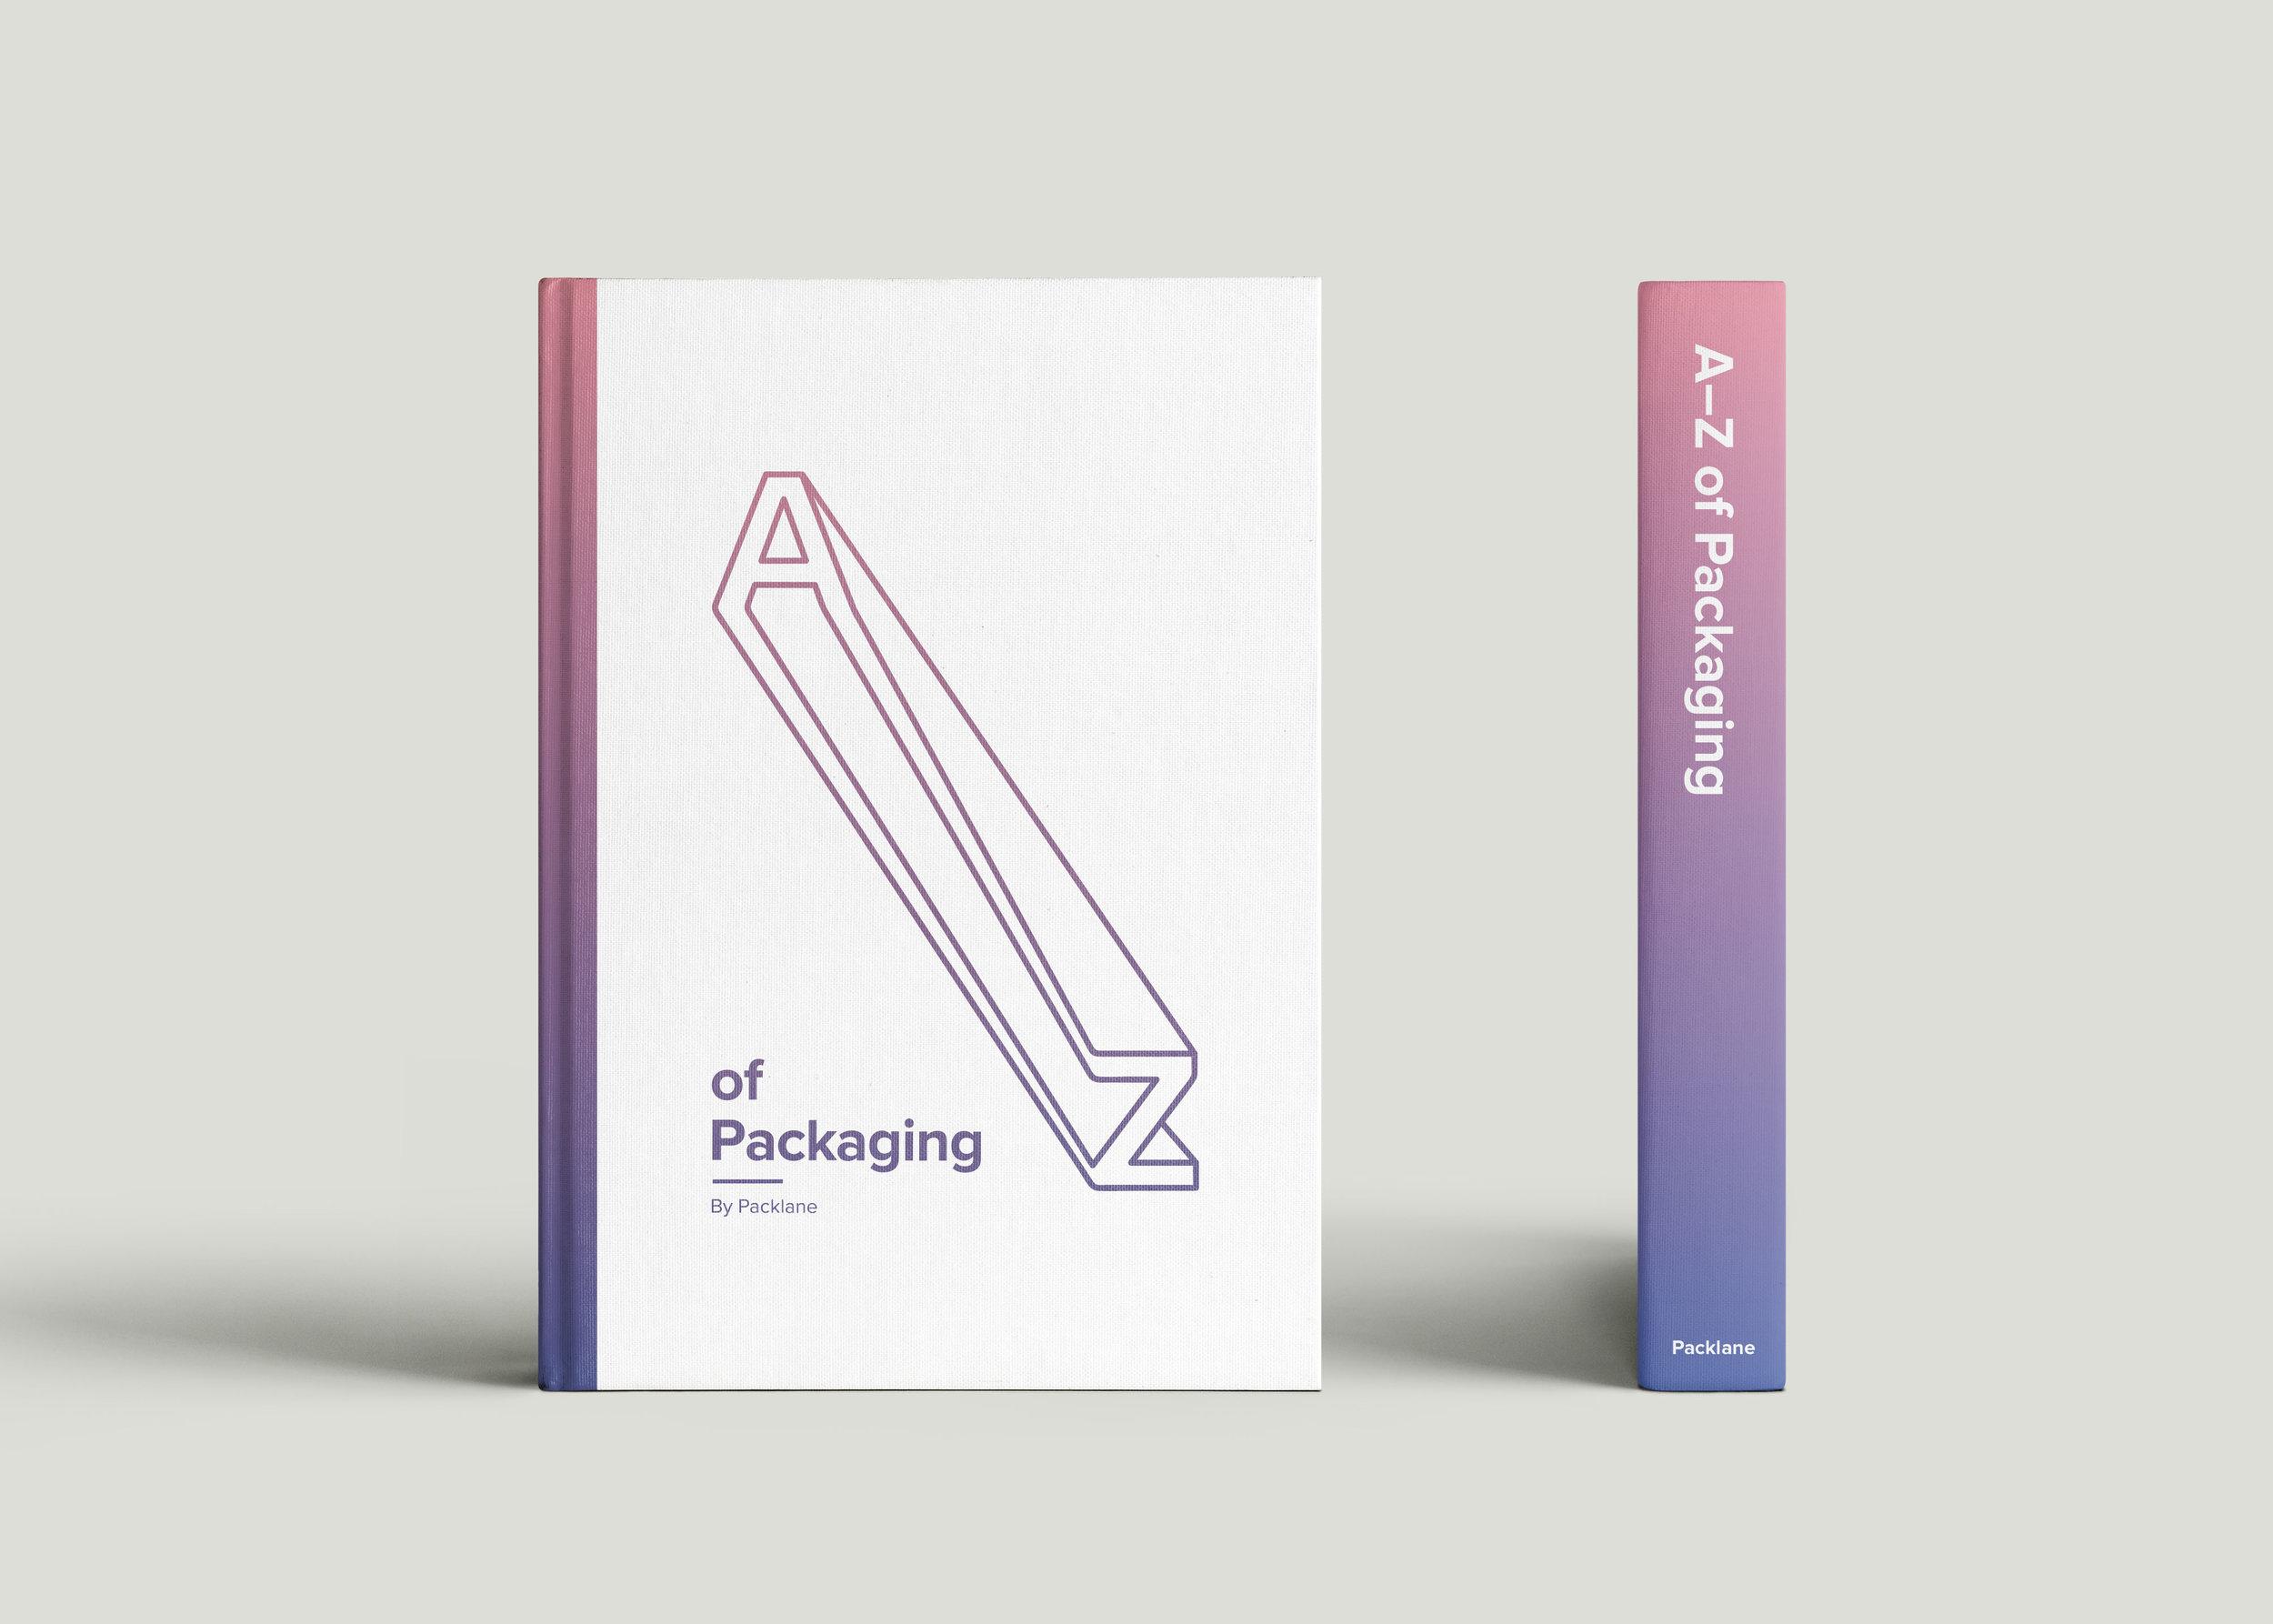 packlane_book_covers.jpg